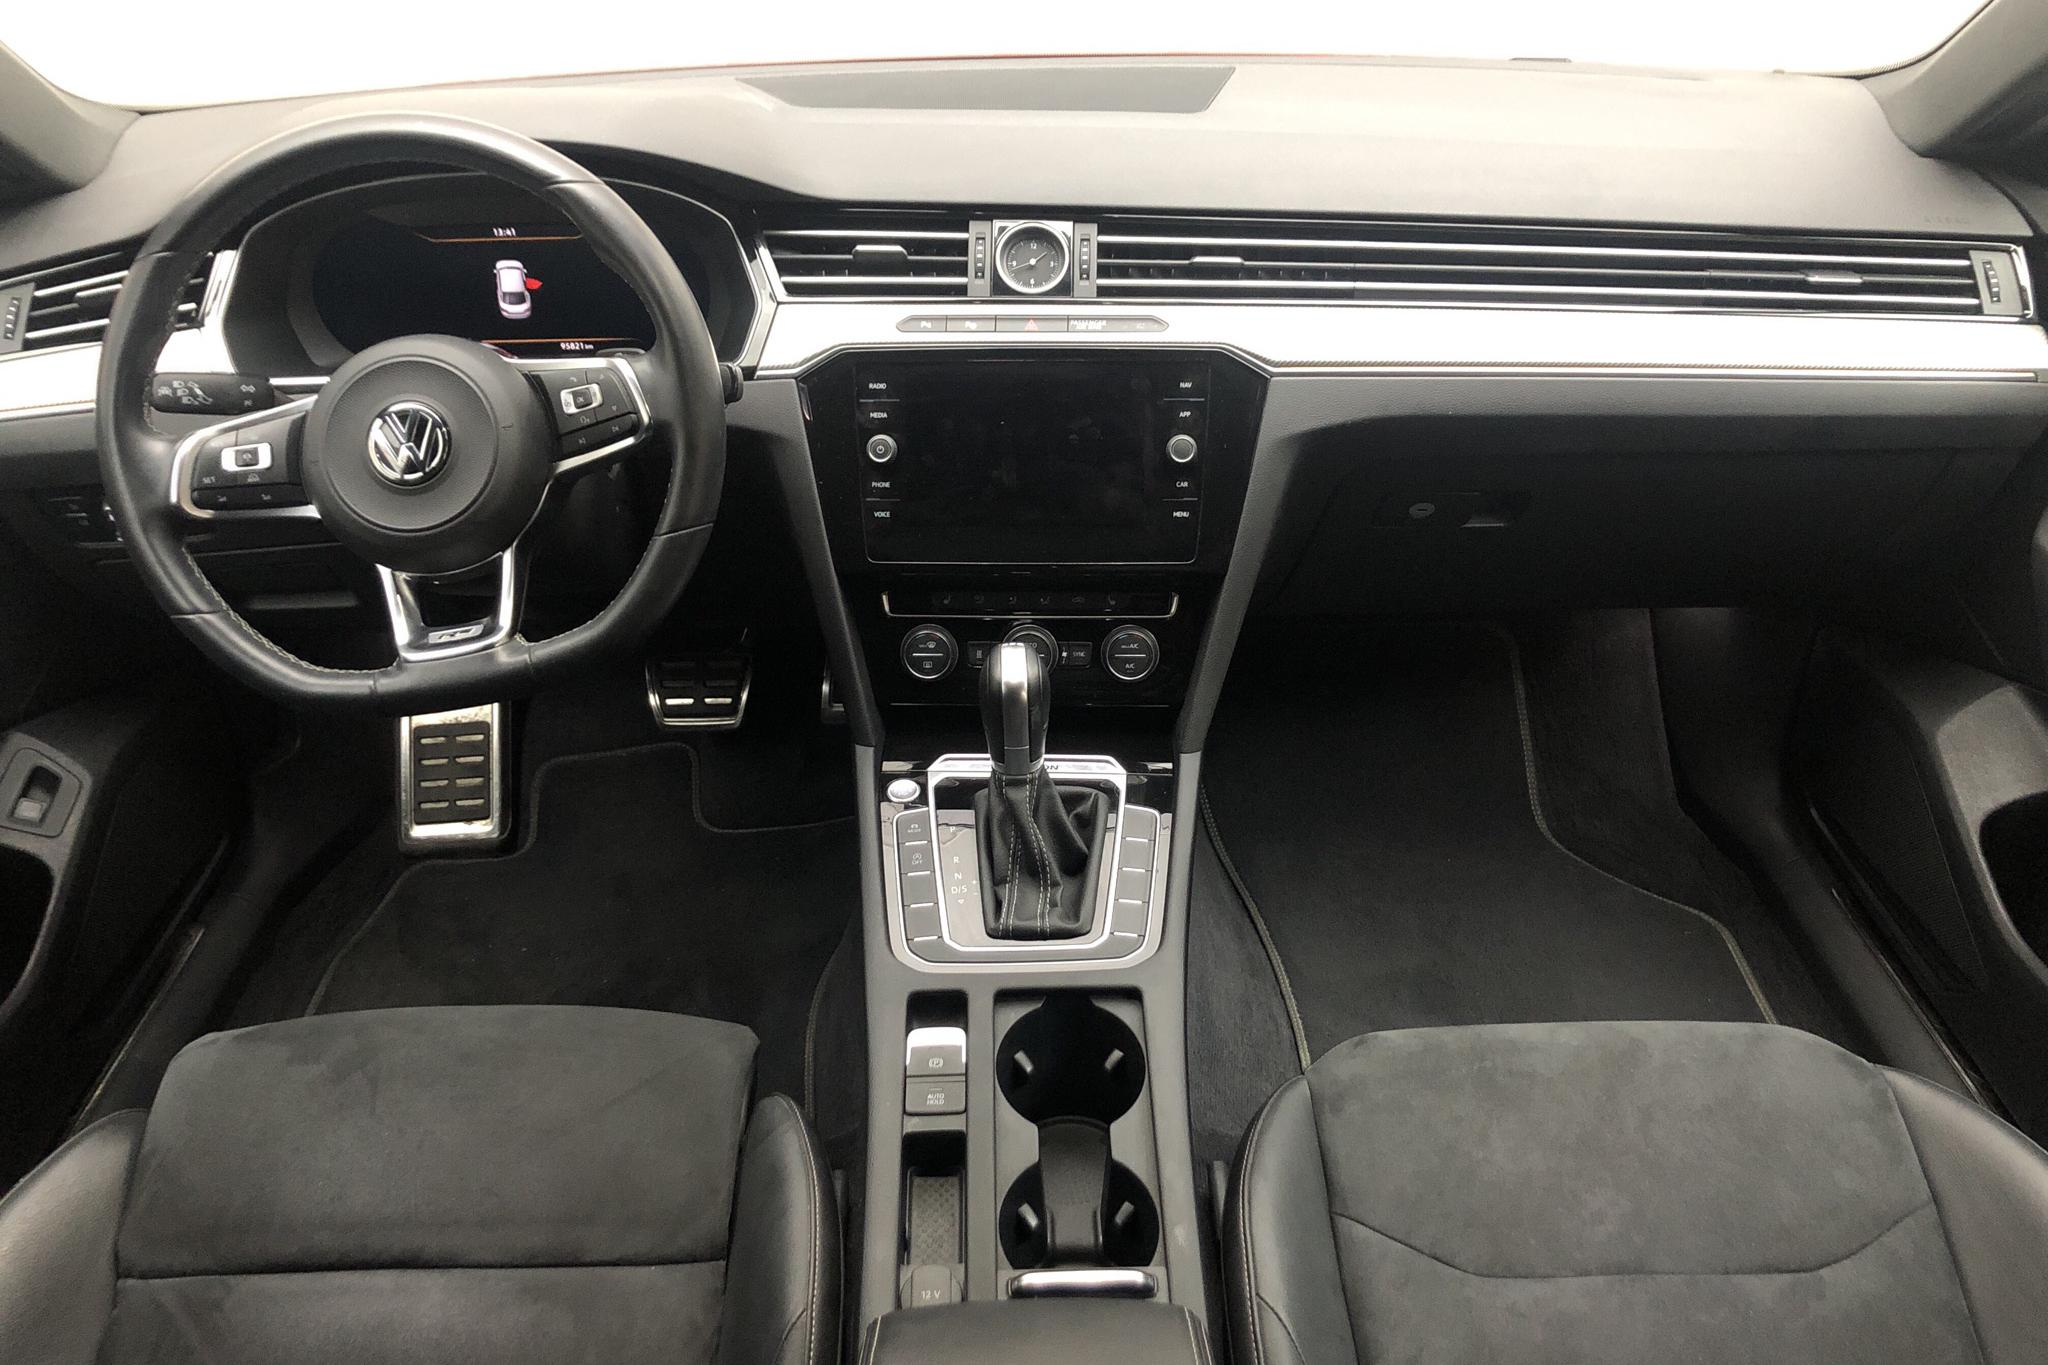 VW Arteon 2.0 TDI 4MOTION (240hk) - 9 581 mil - Automat - Dark Red - 2018